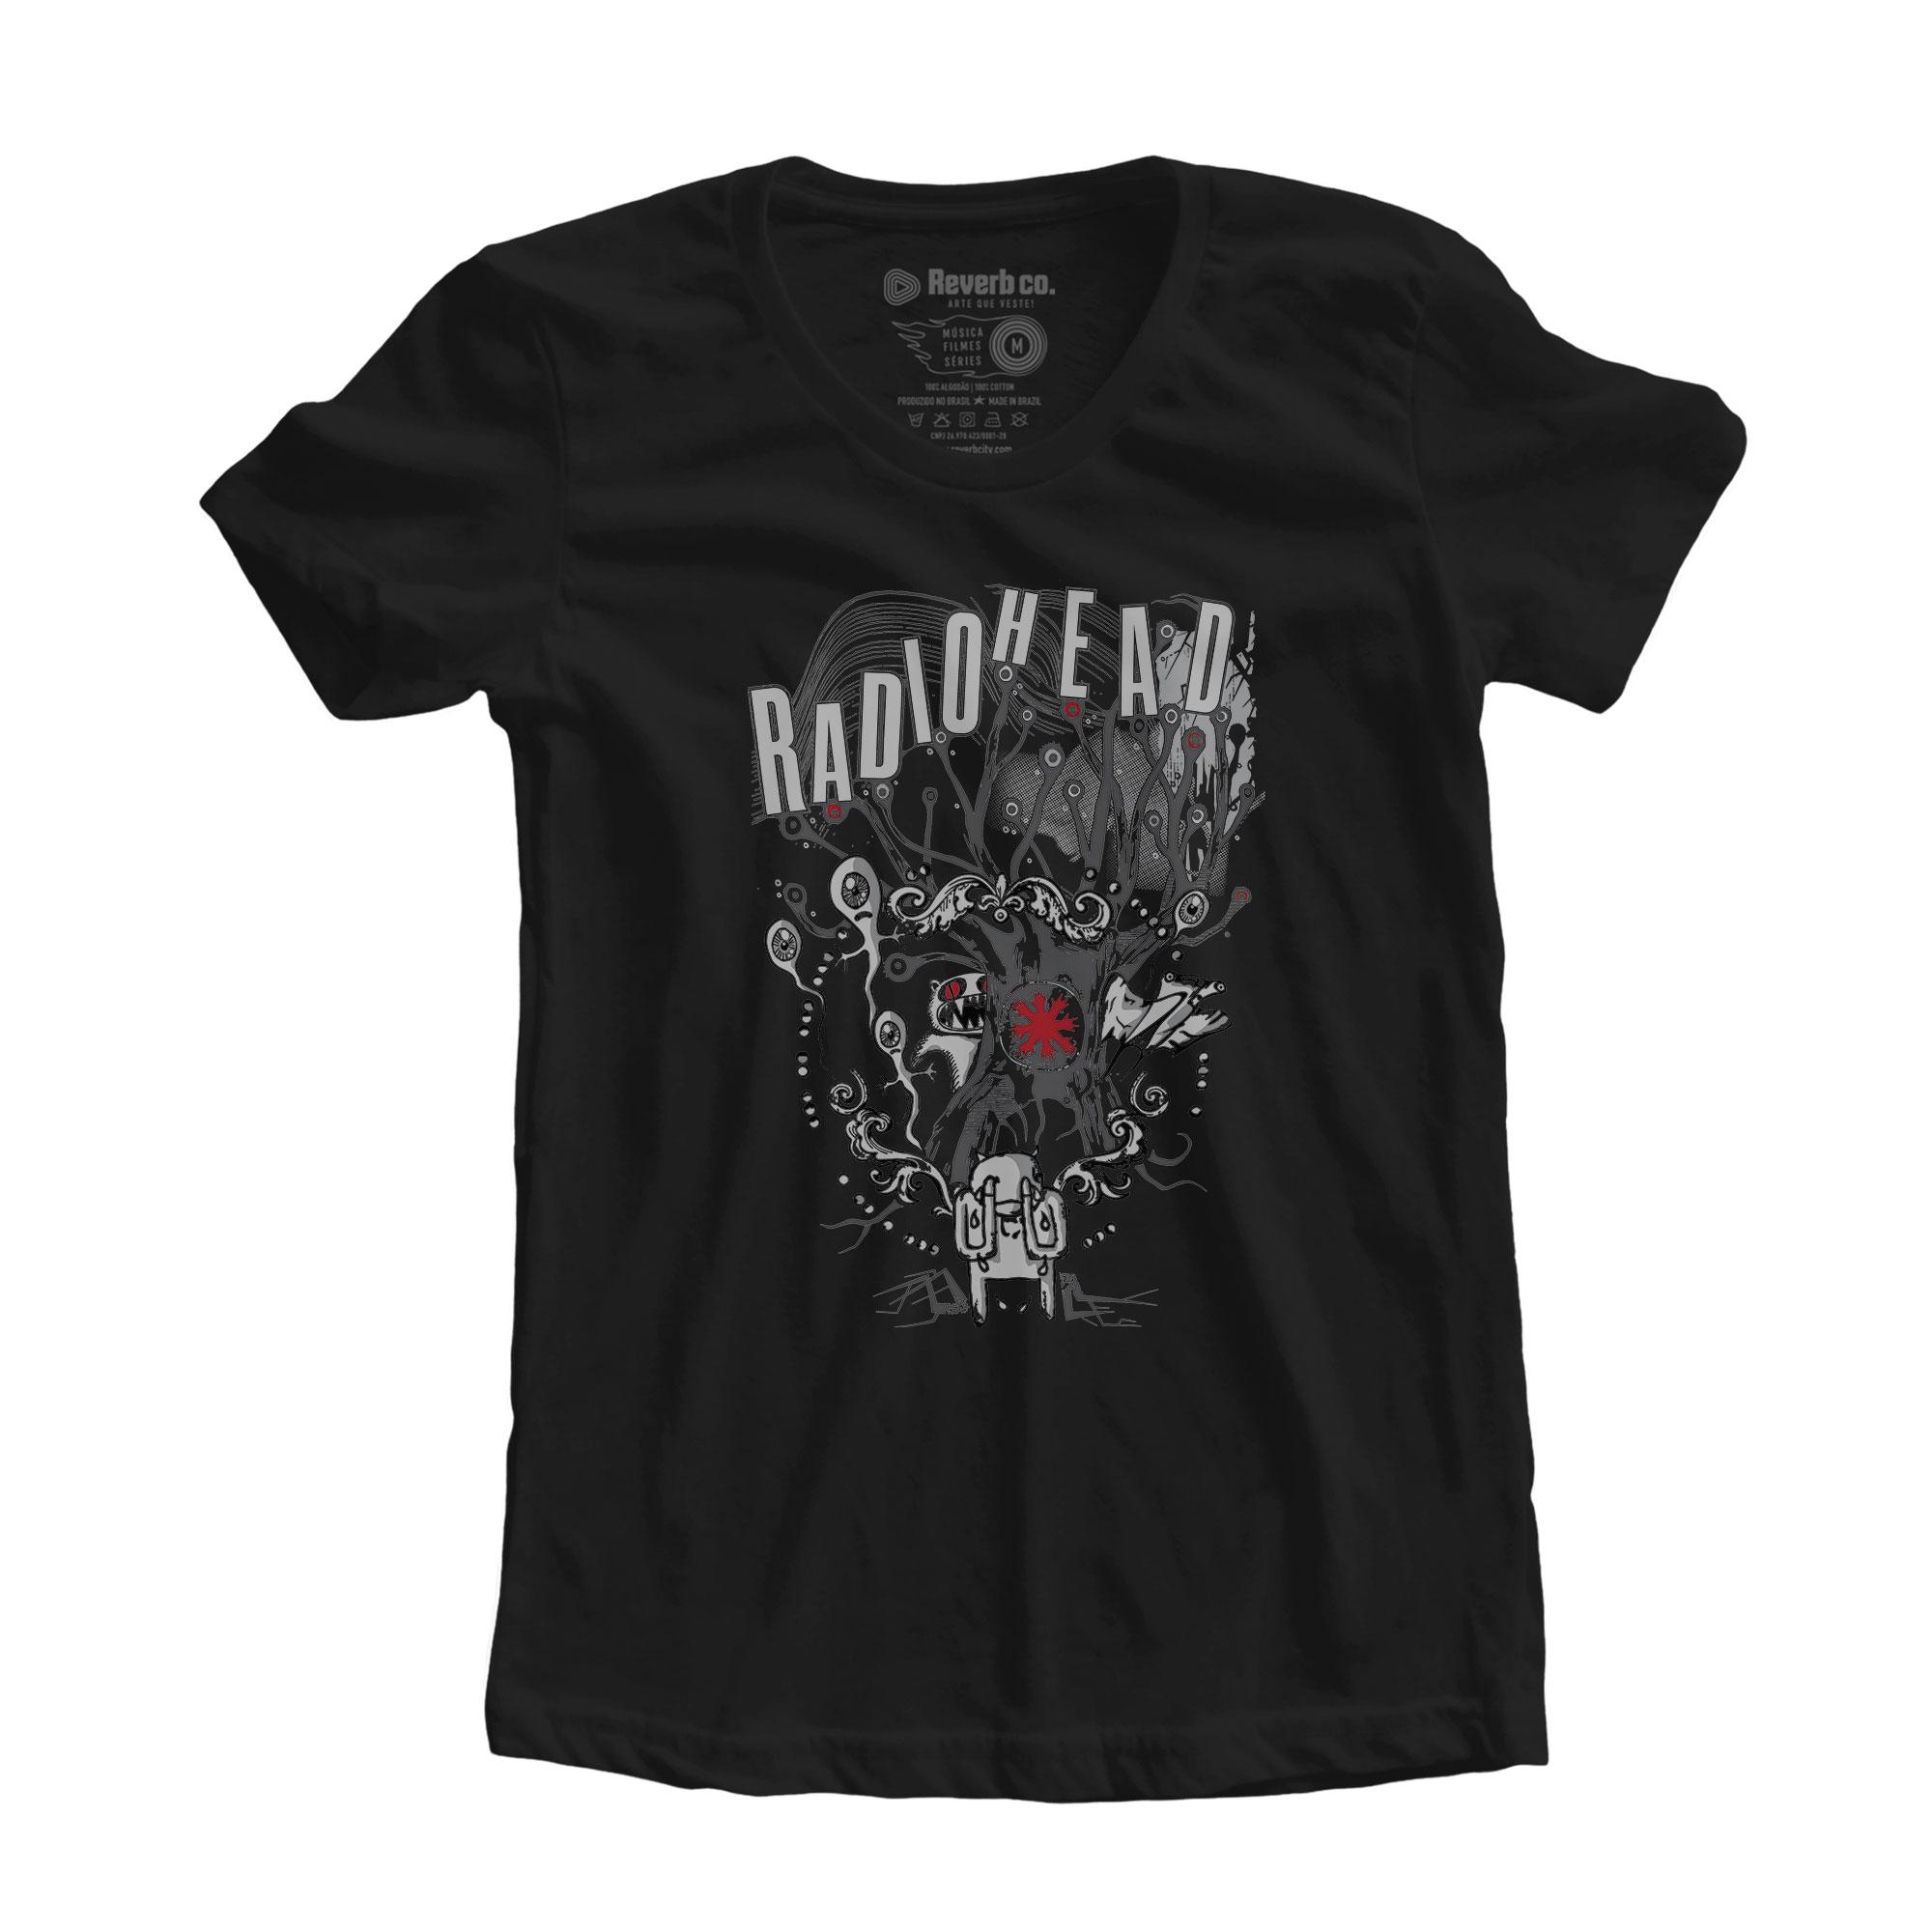 Camiseta Radiohead - Feminino